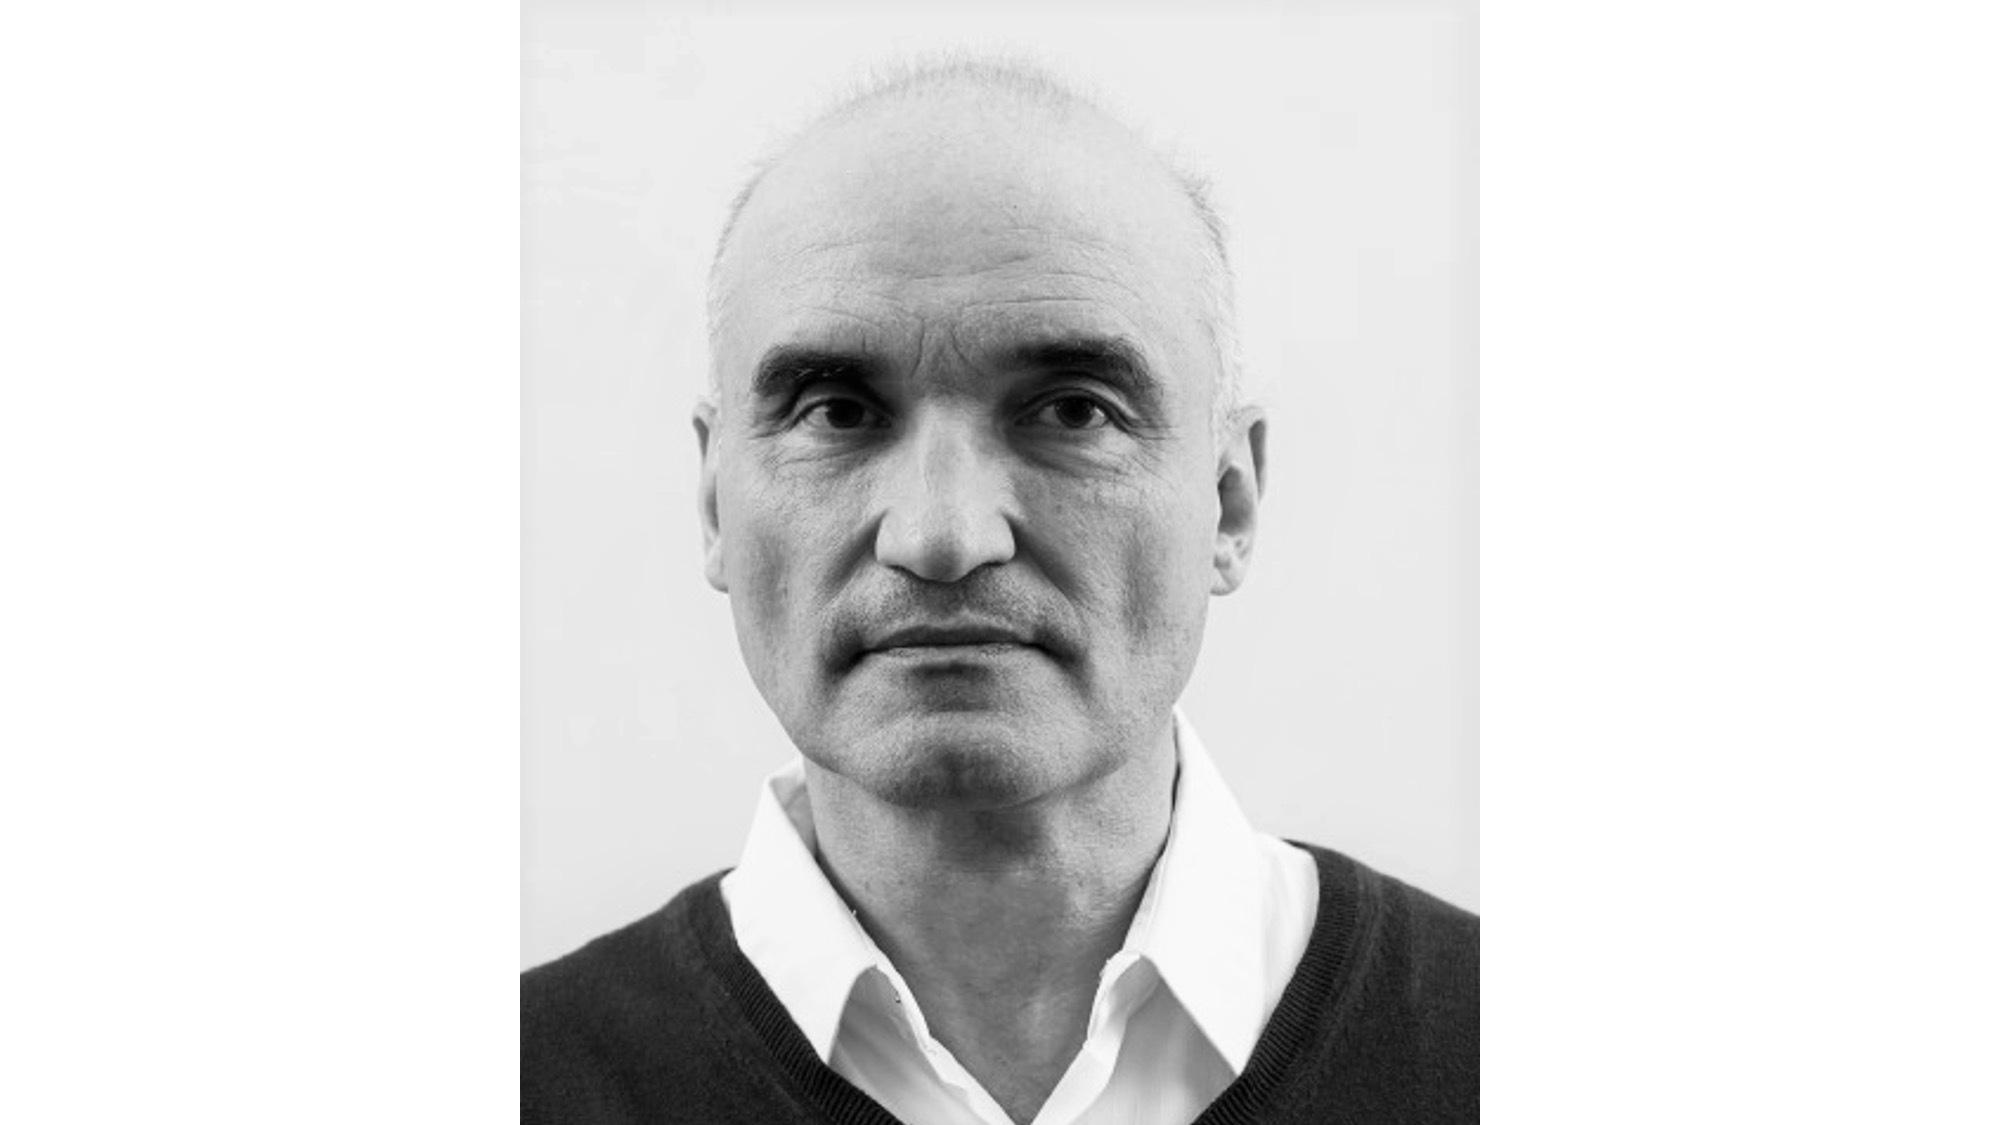 Jean-Michel Morel, global leader in the field of scientific image processing, on the digital darkroom of satellite imagery